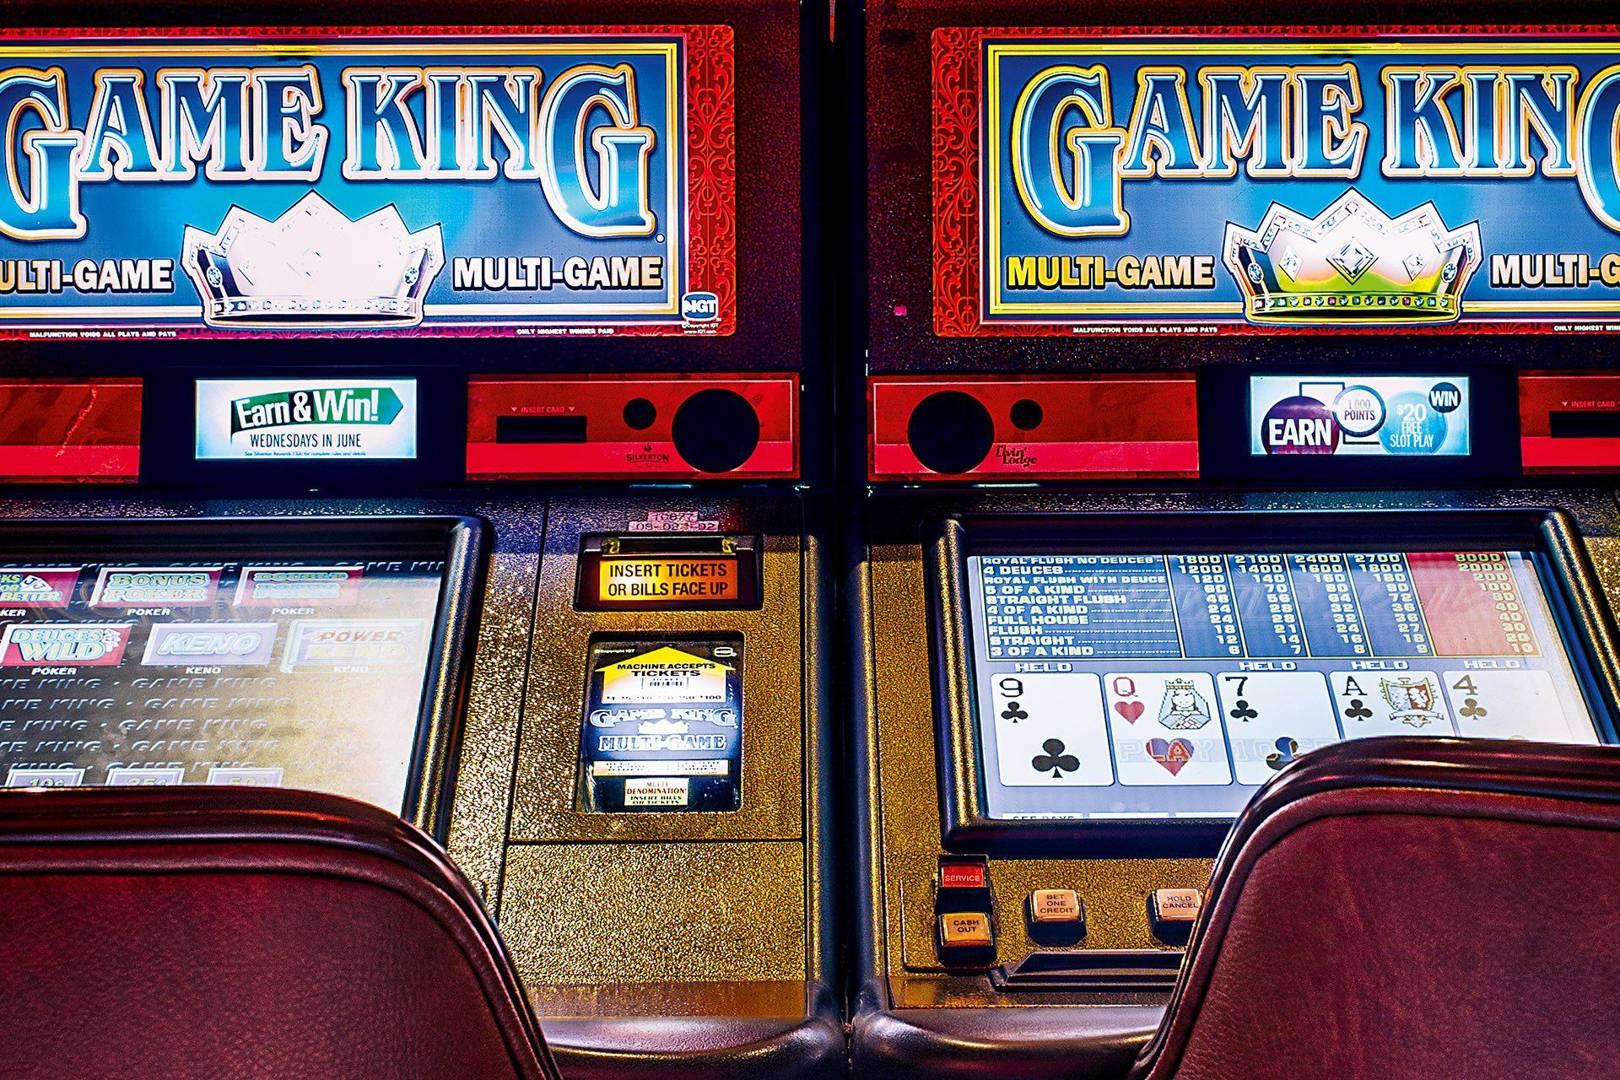 Zapping slot machines case lawsinteractive gambling act 2001 in australia